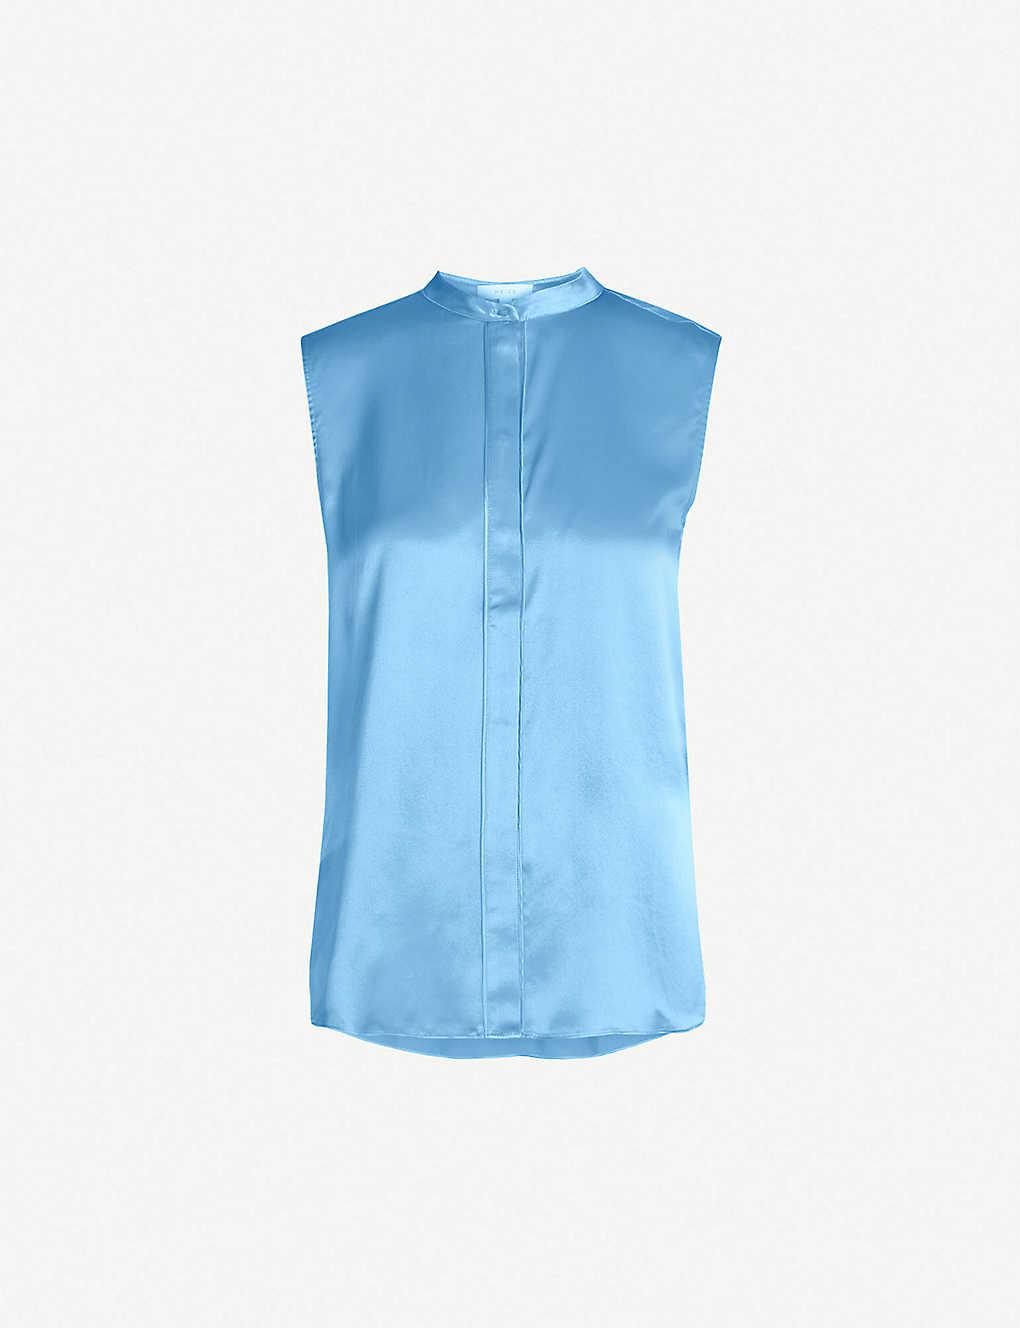 c6b334eaa22bf4 REISS - Lila silk-satin covered-placket top | Selfridges.com